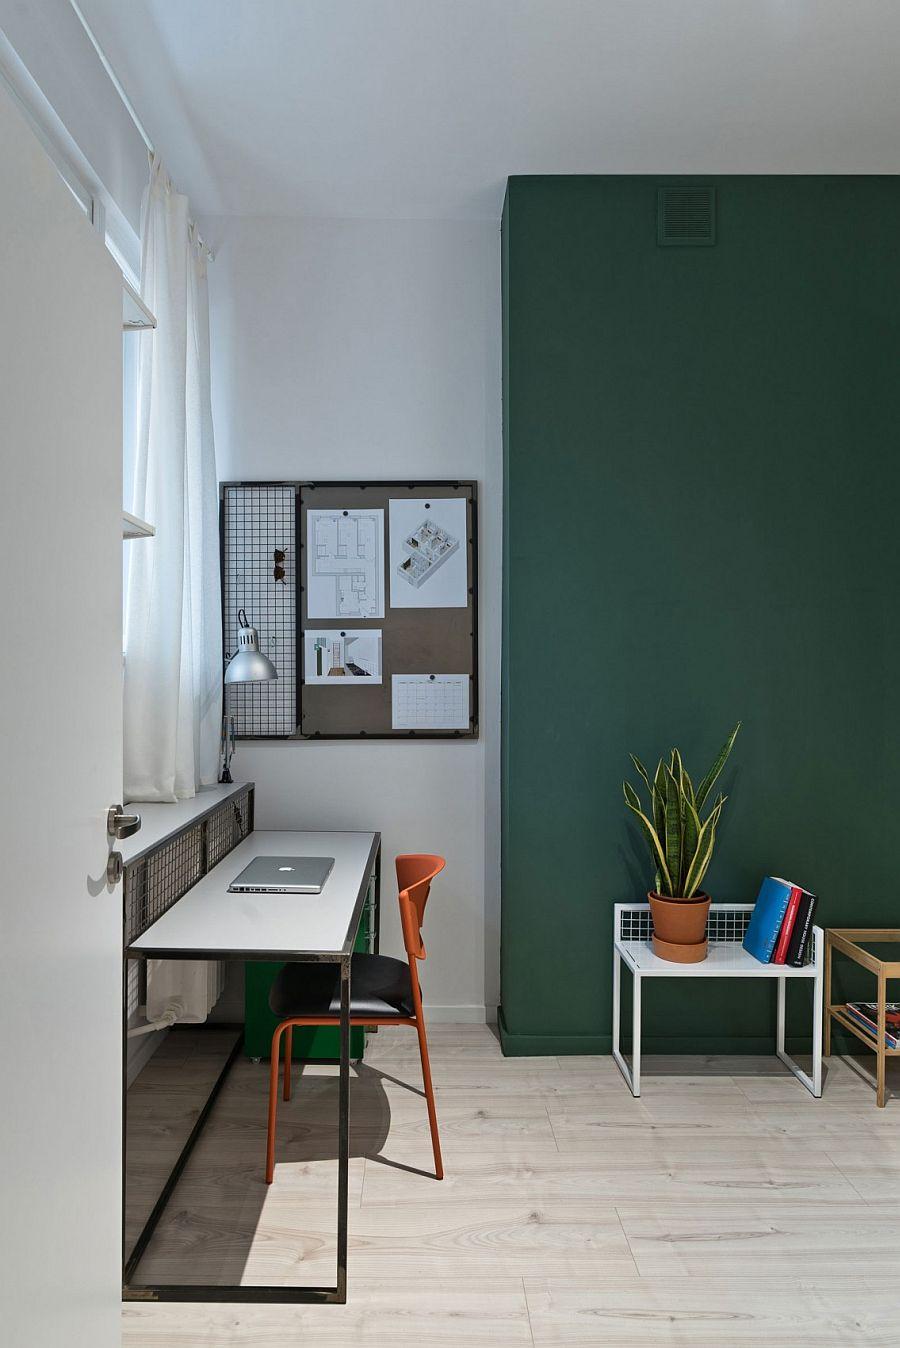 Corner workspace idea for small, urban apartments